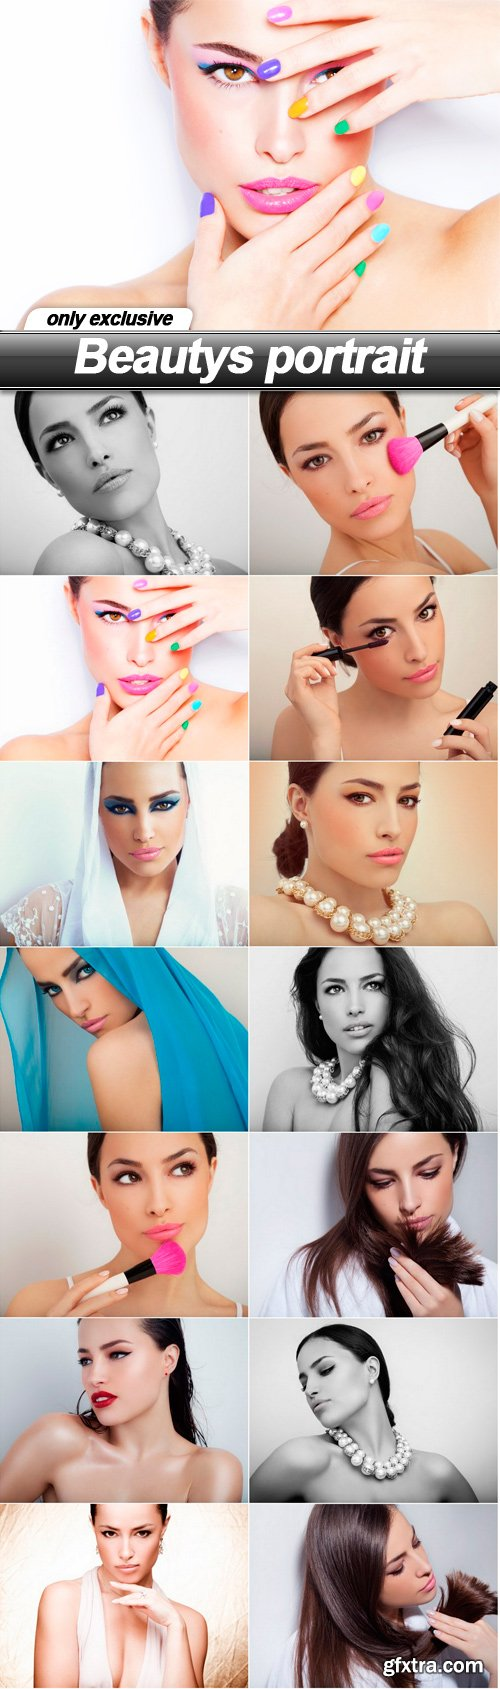 Beautys portrait - 14 UHQ JPEG